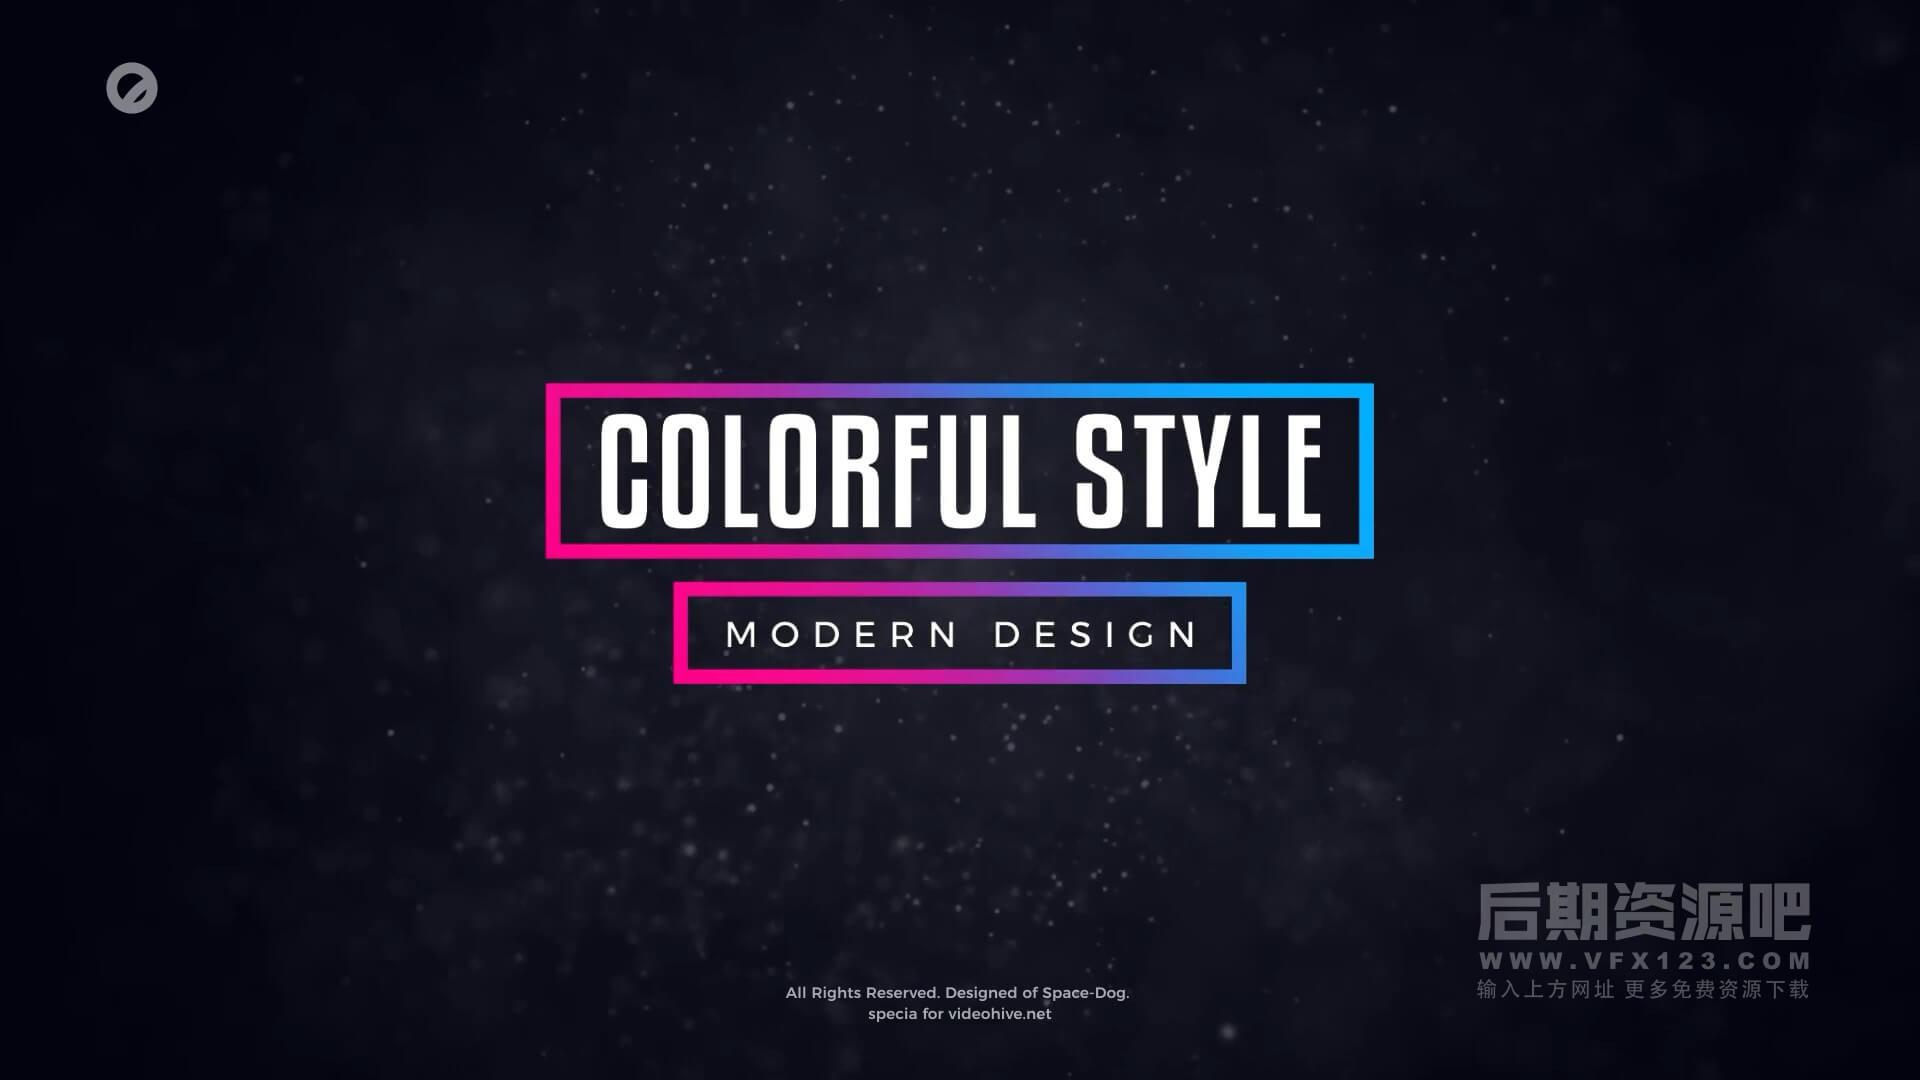 fcpx标题预设 4K30组简约彩色字幕条排版动画模板 Colorful Titles